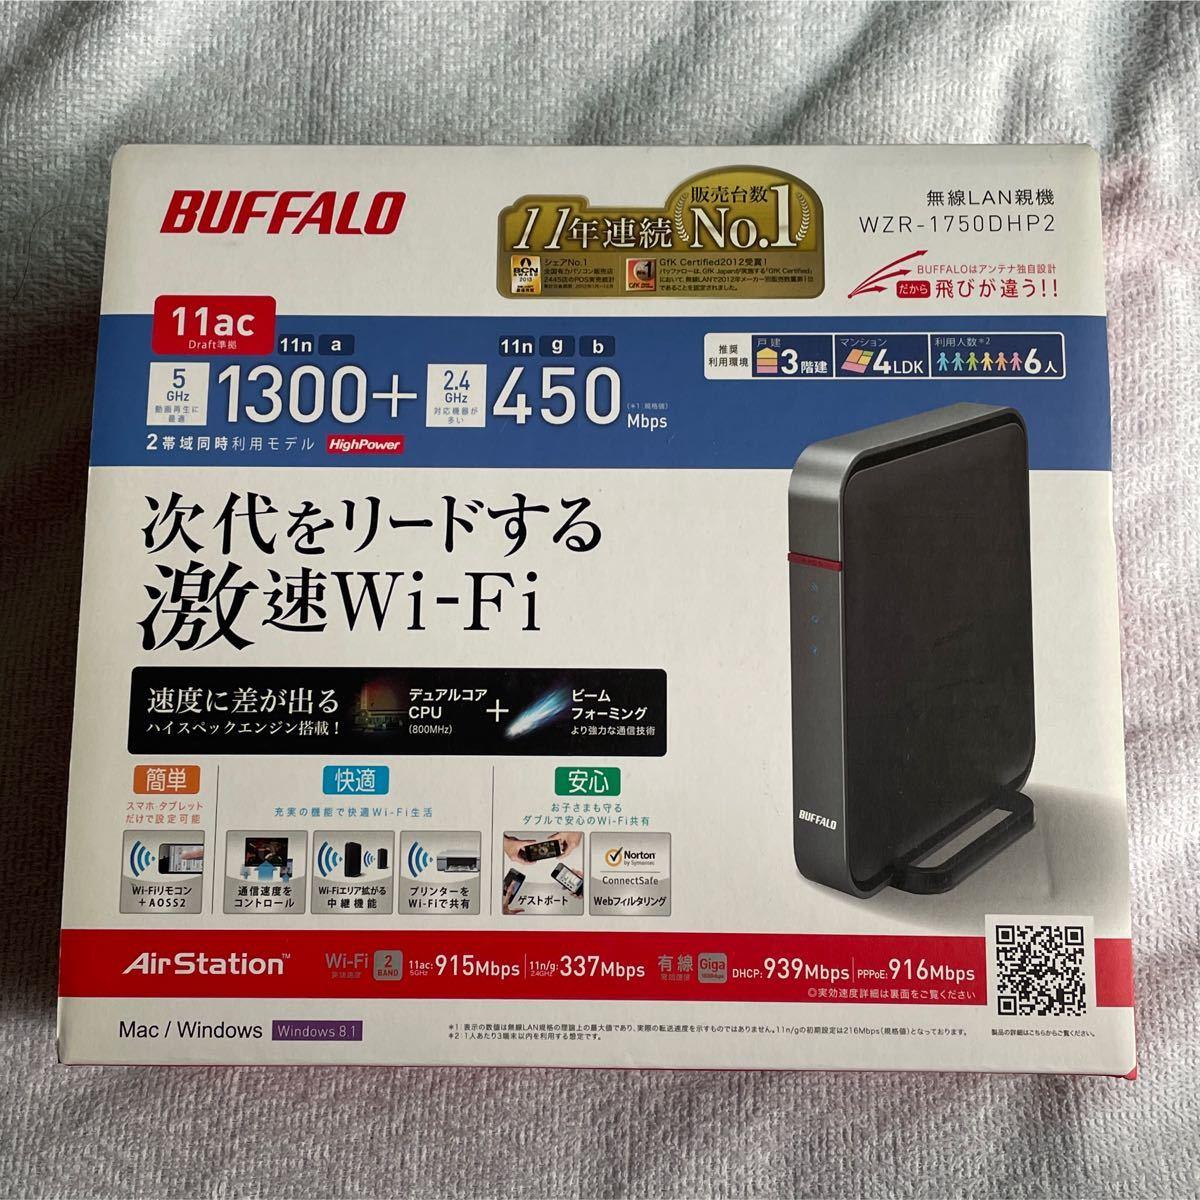 BUFFALO WZR-1750DHP2 無線LANルーター